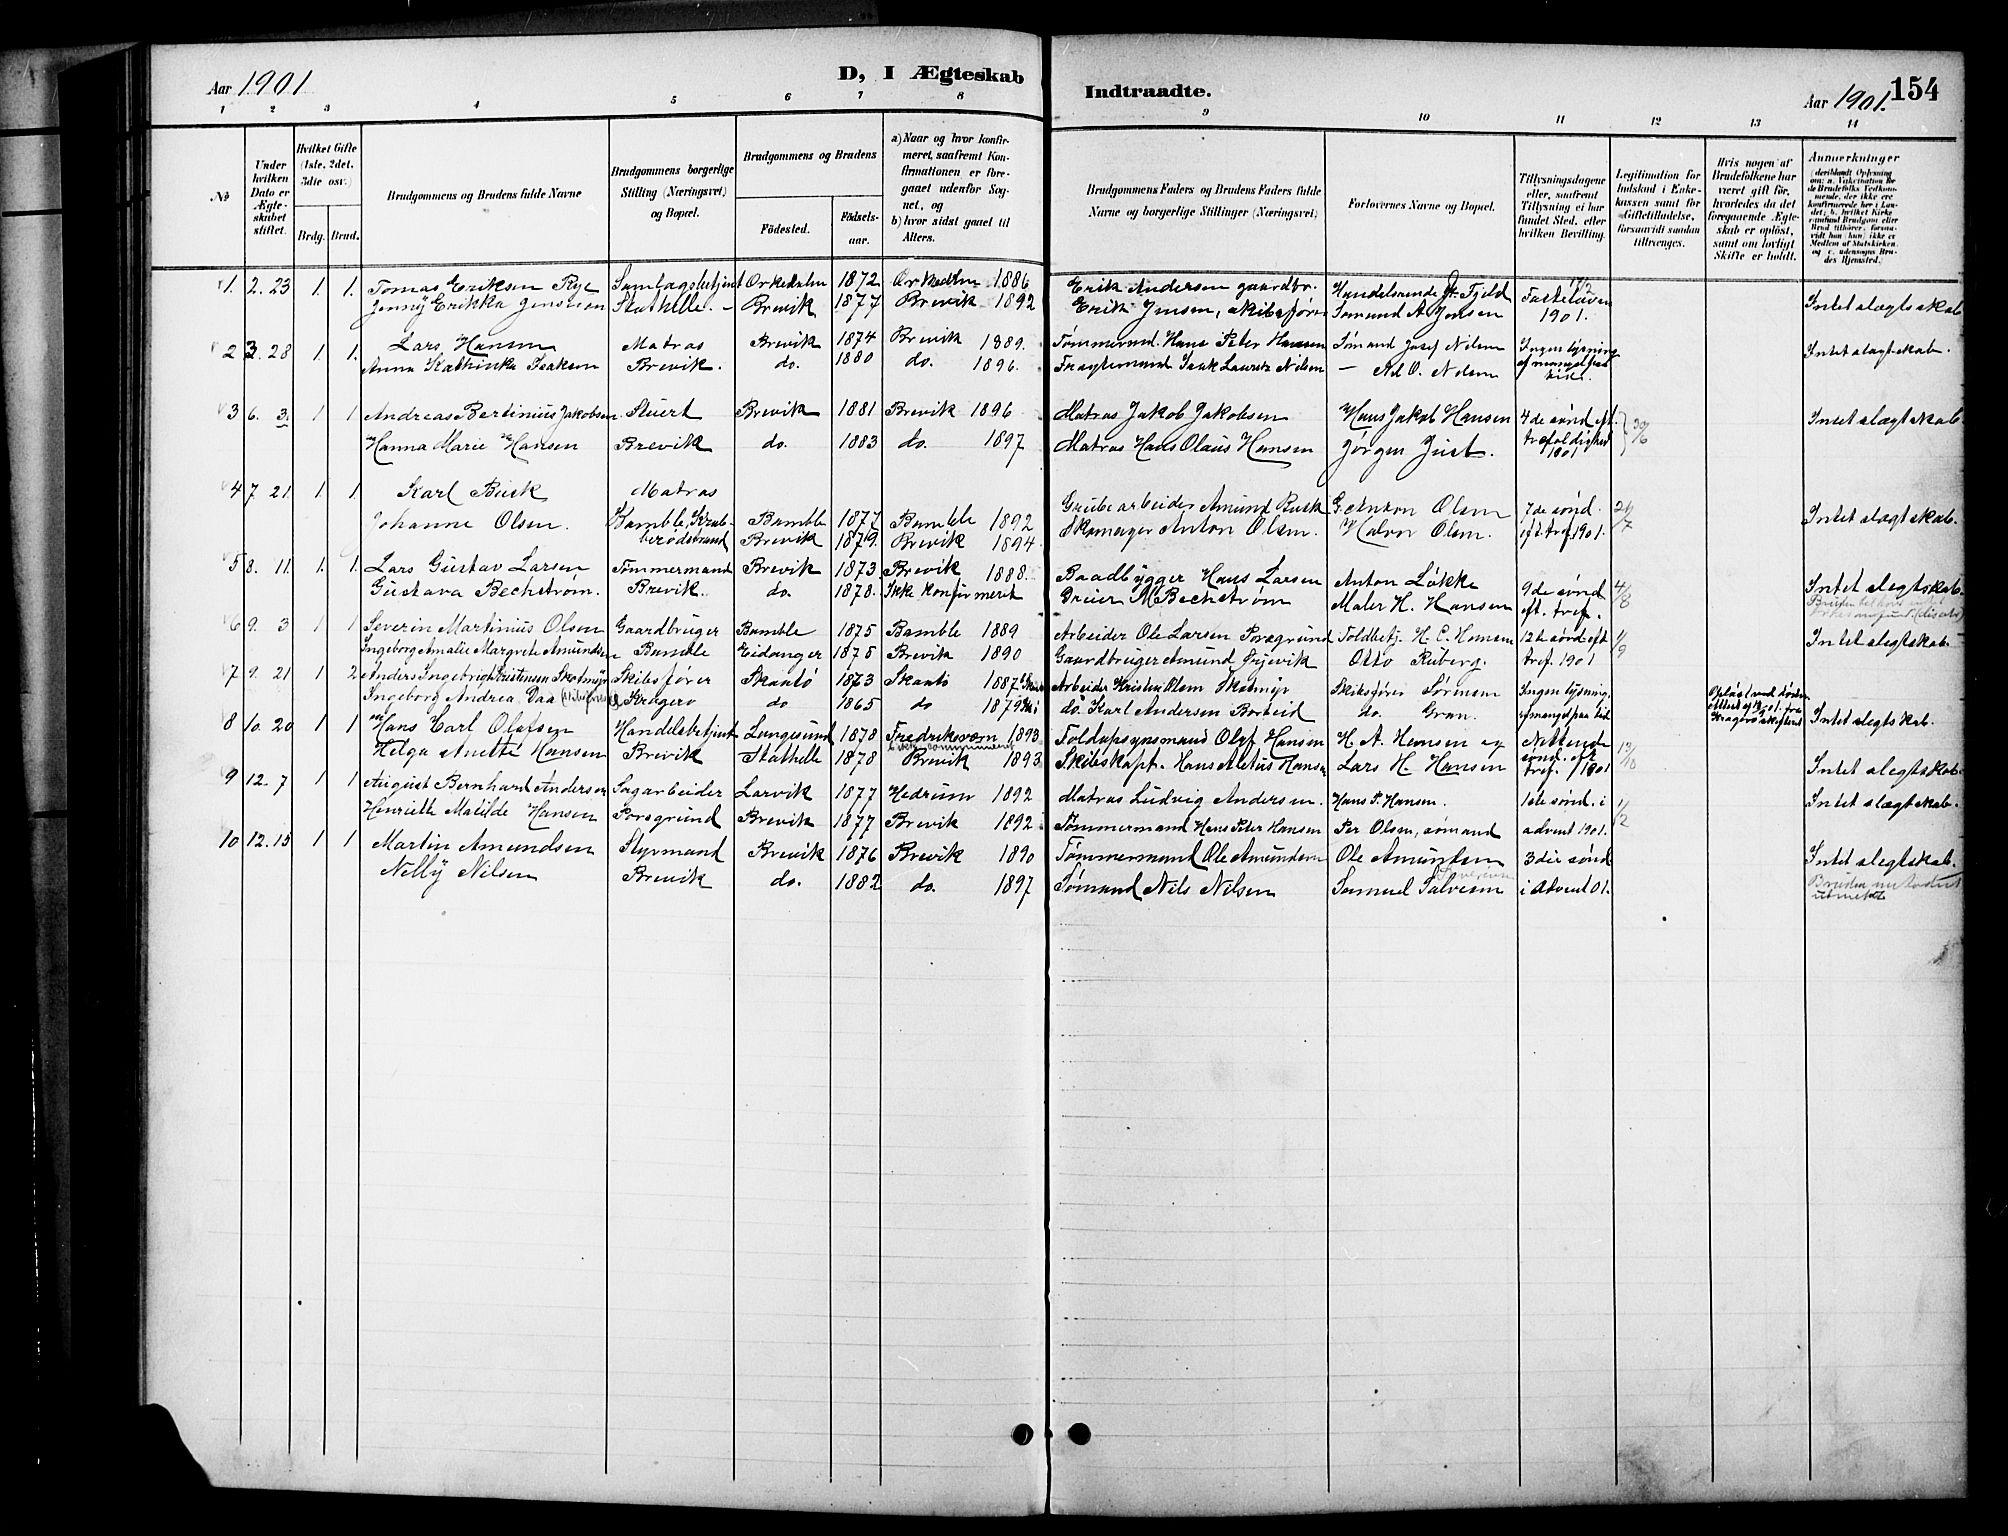 SAKO, Brevik kirkebøker, G/Ga/L0005: Klokkerbok nr. 5, 1901-1924, s. 154